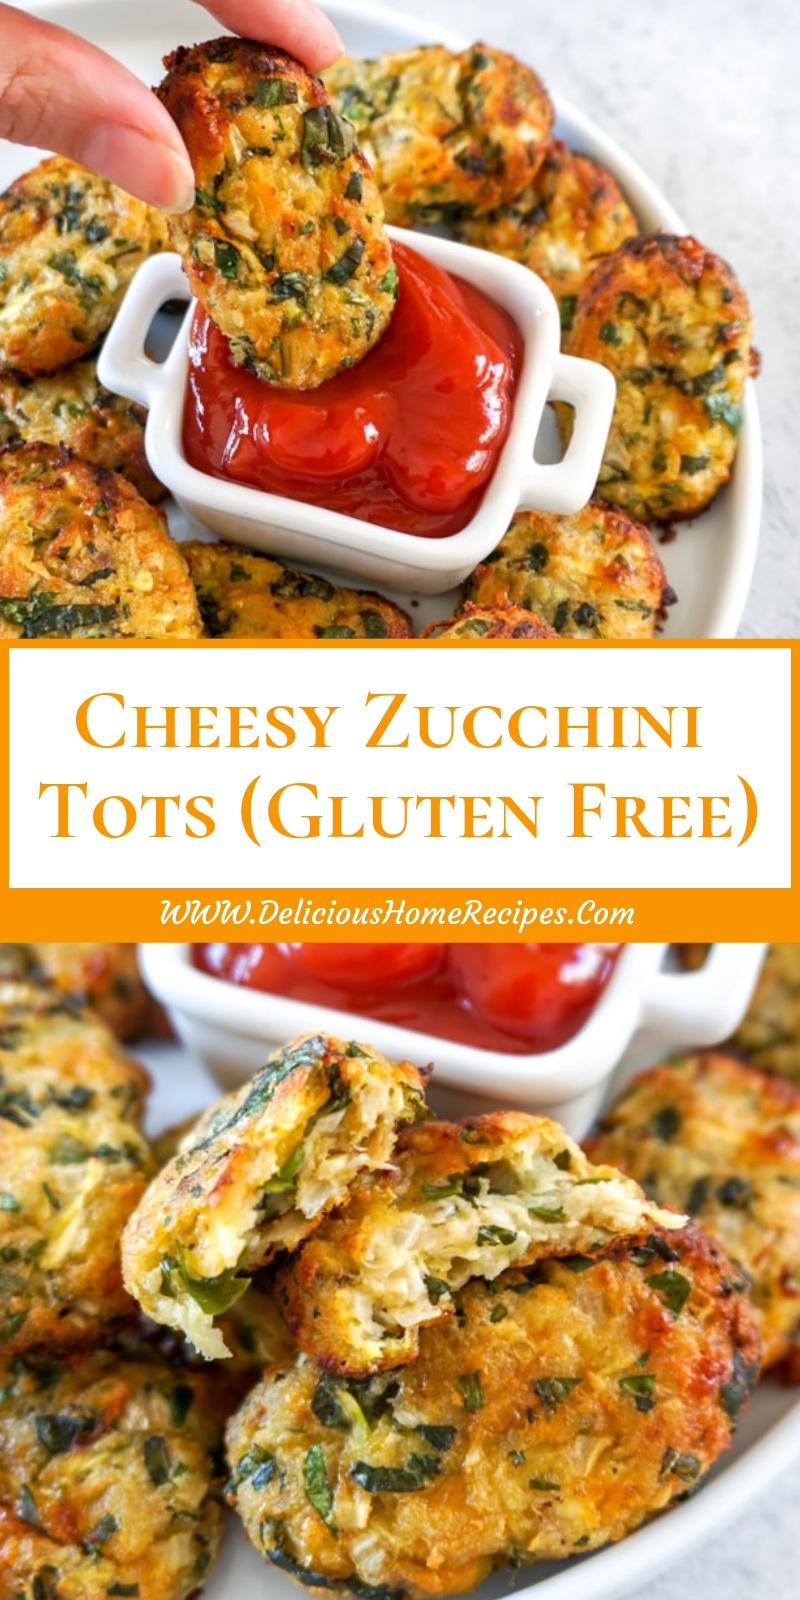 Cheesy Zucchini Tots (Gluten Free)